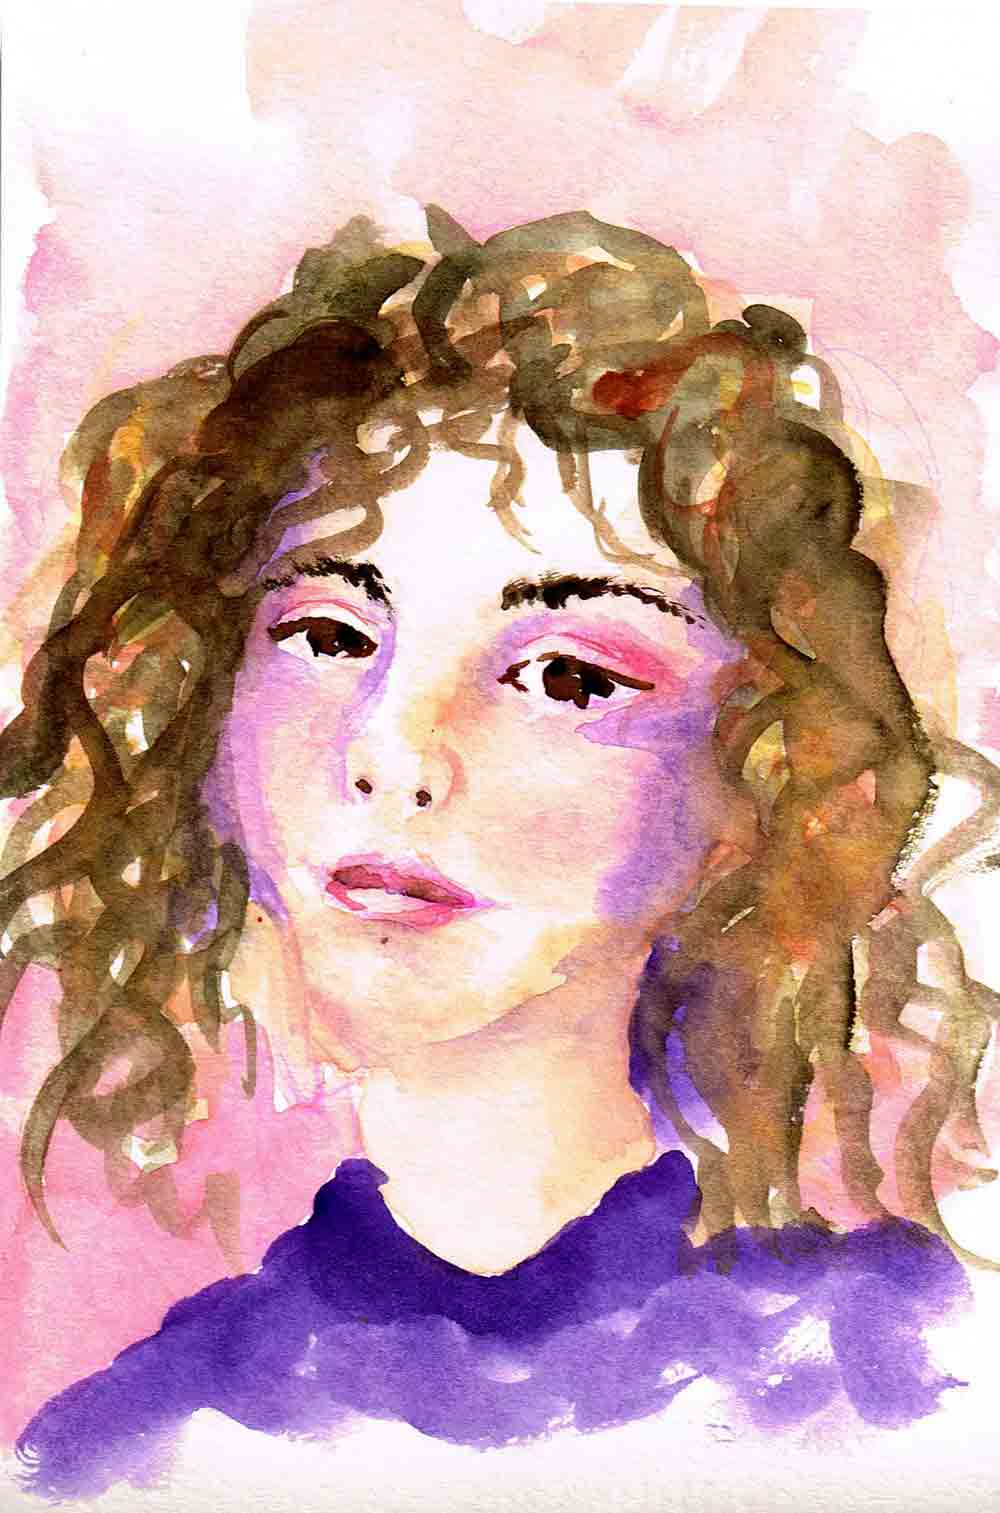 Watercolour-Portraits-6-I-am-kw.jpg